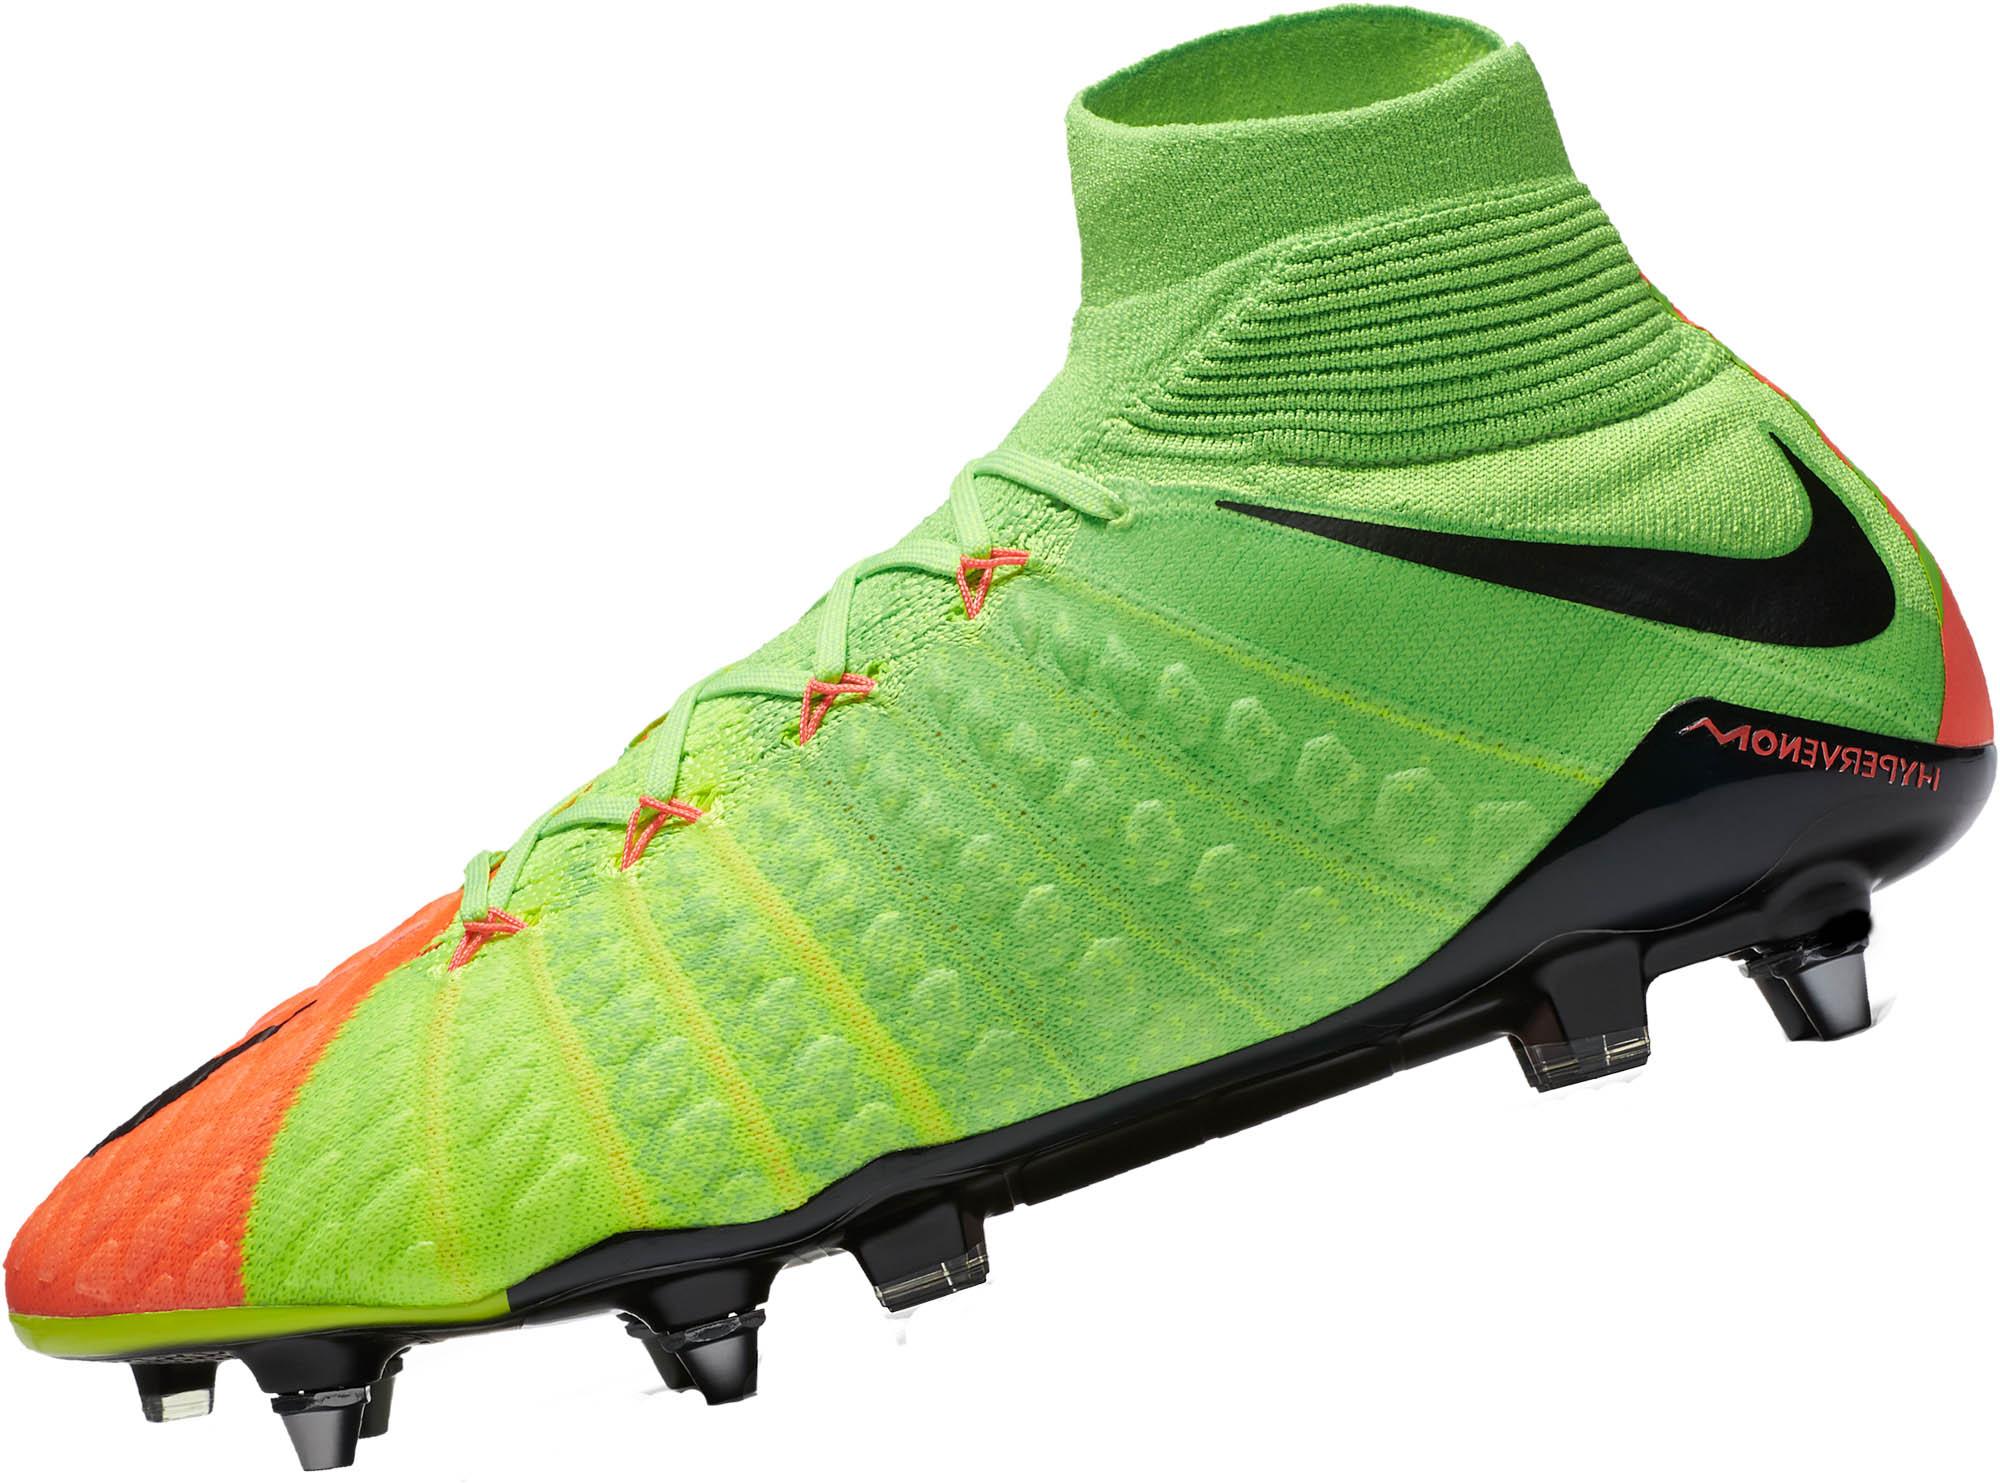 new product eaeeb 17a2c Nike Hypervenom Phantom DF III SG-Pro - Electric Green ...